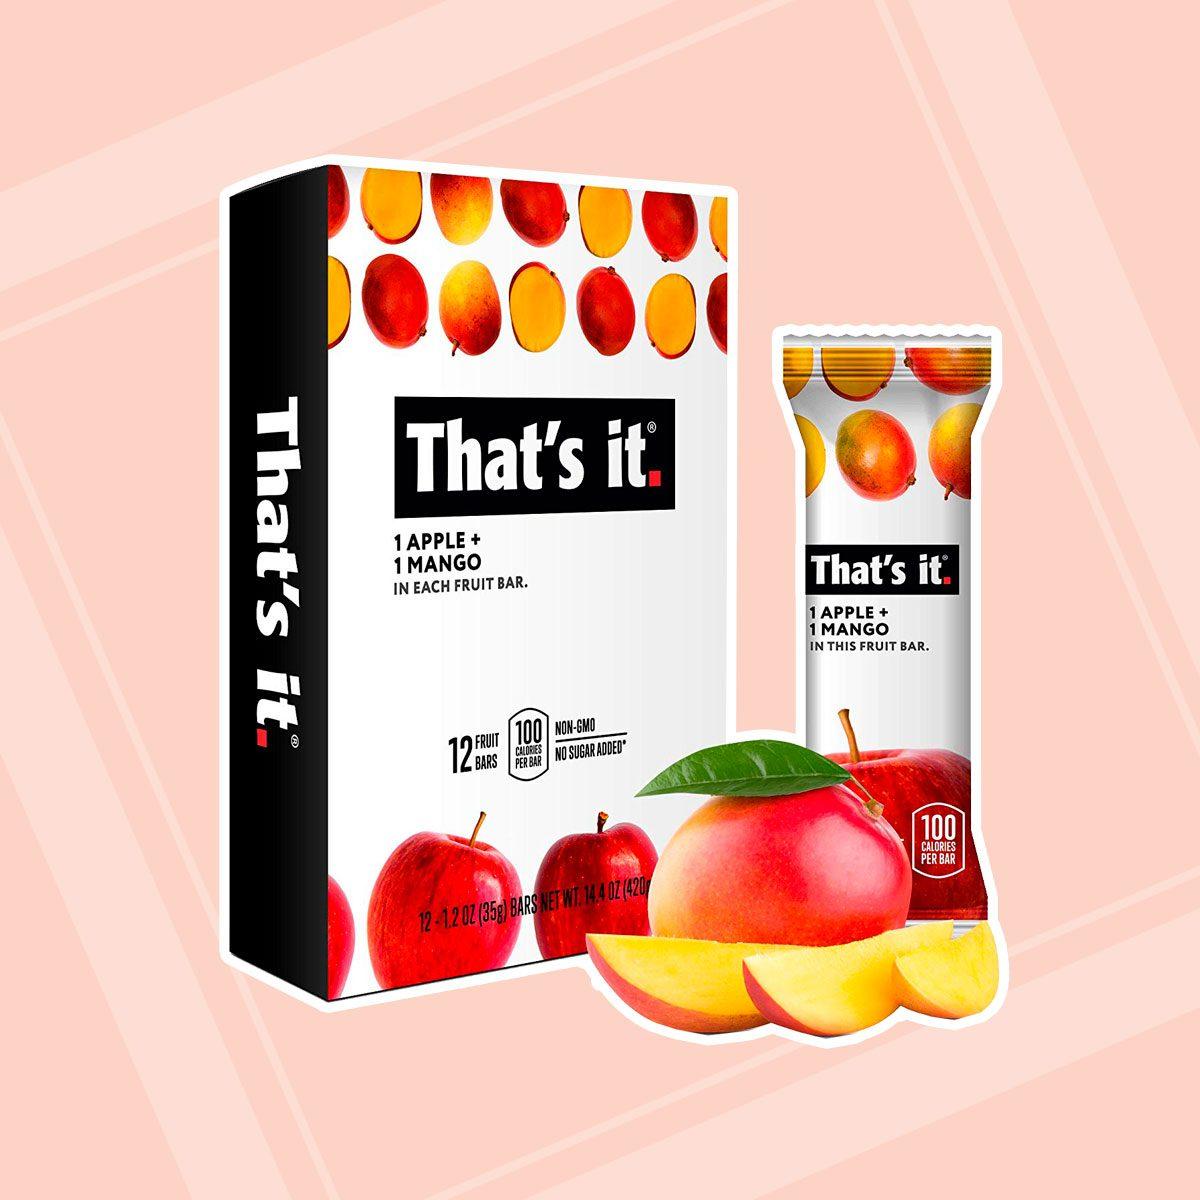 That's it. Apple + Mango 100% Natural Real Fruit Bar